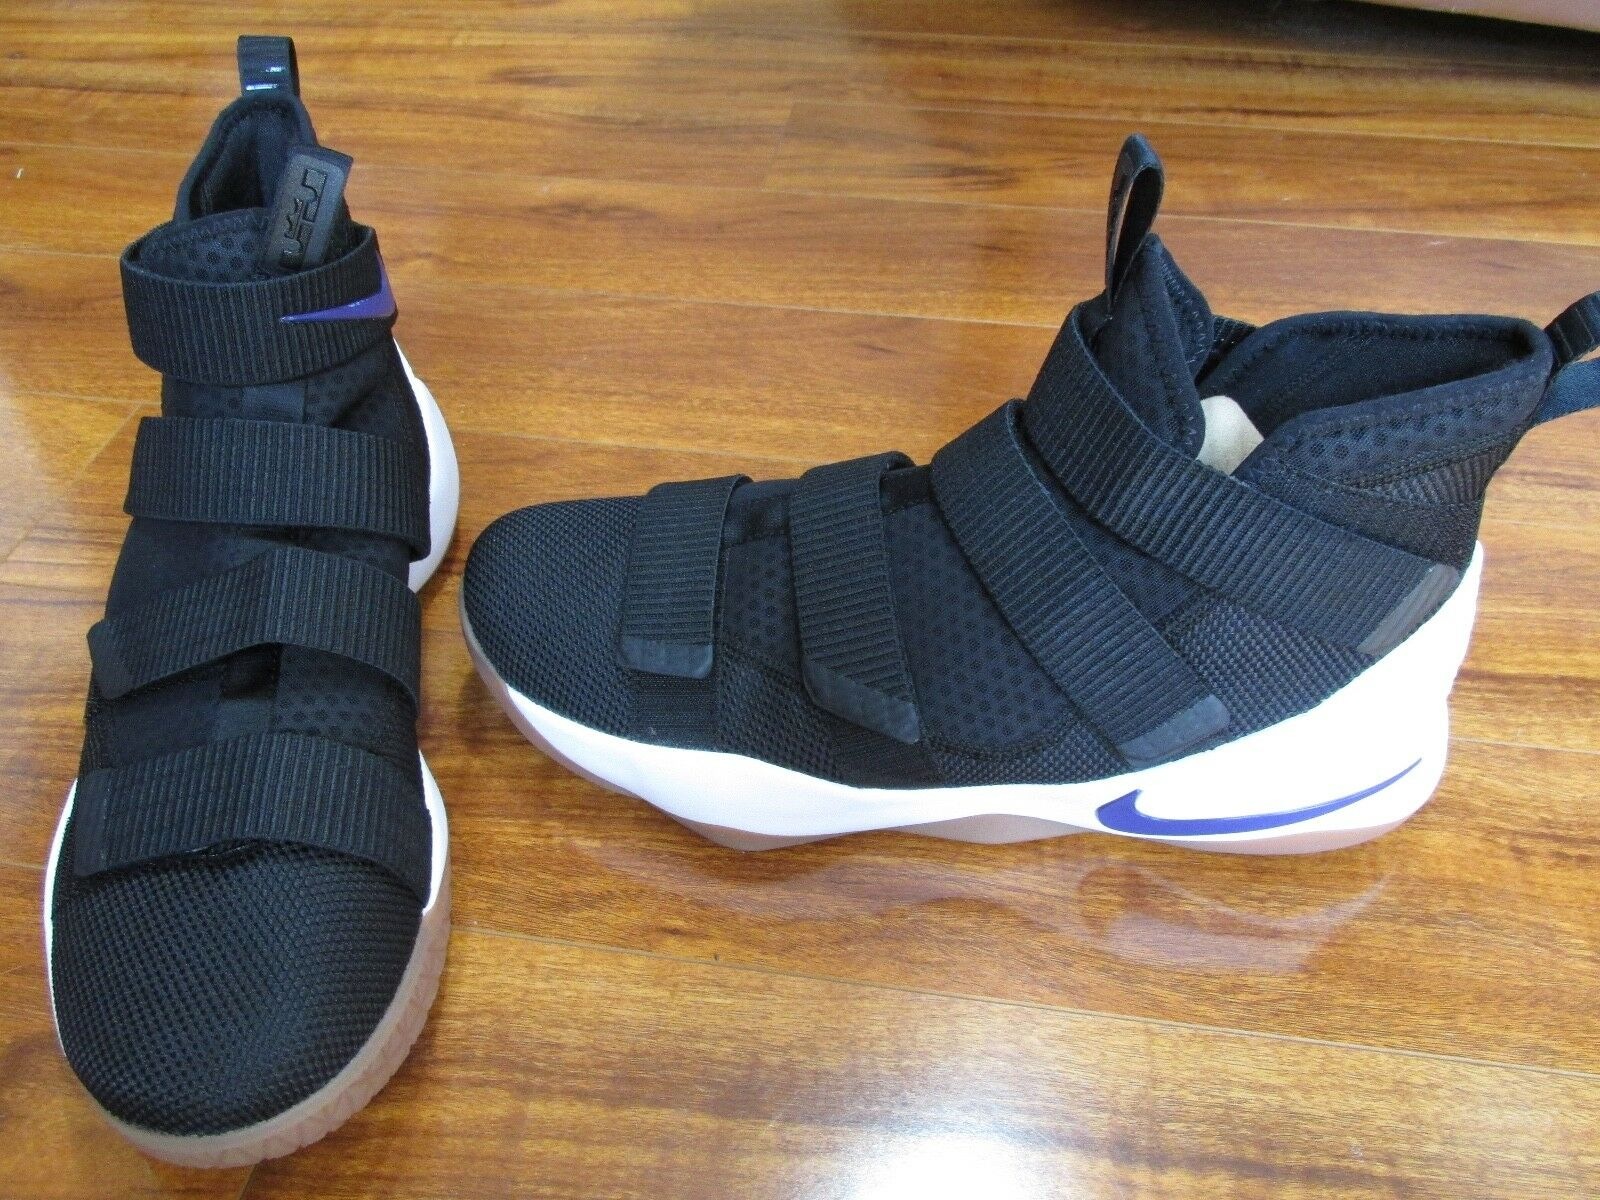 e4dcf346cc1 New Nike ID ID ID LeBron Soldier XI Basketball Shoes MENS 14 BLACK PURPLE  WHITE A02577 10d32c